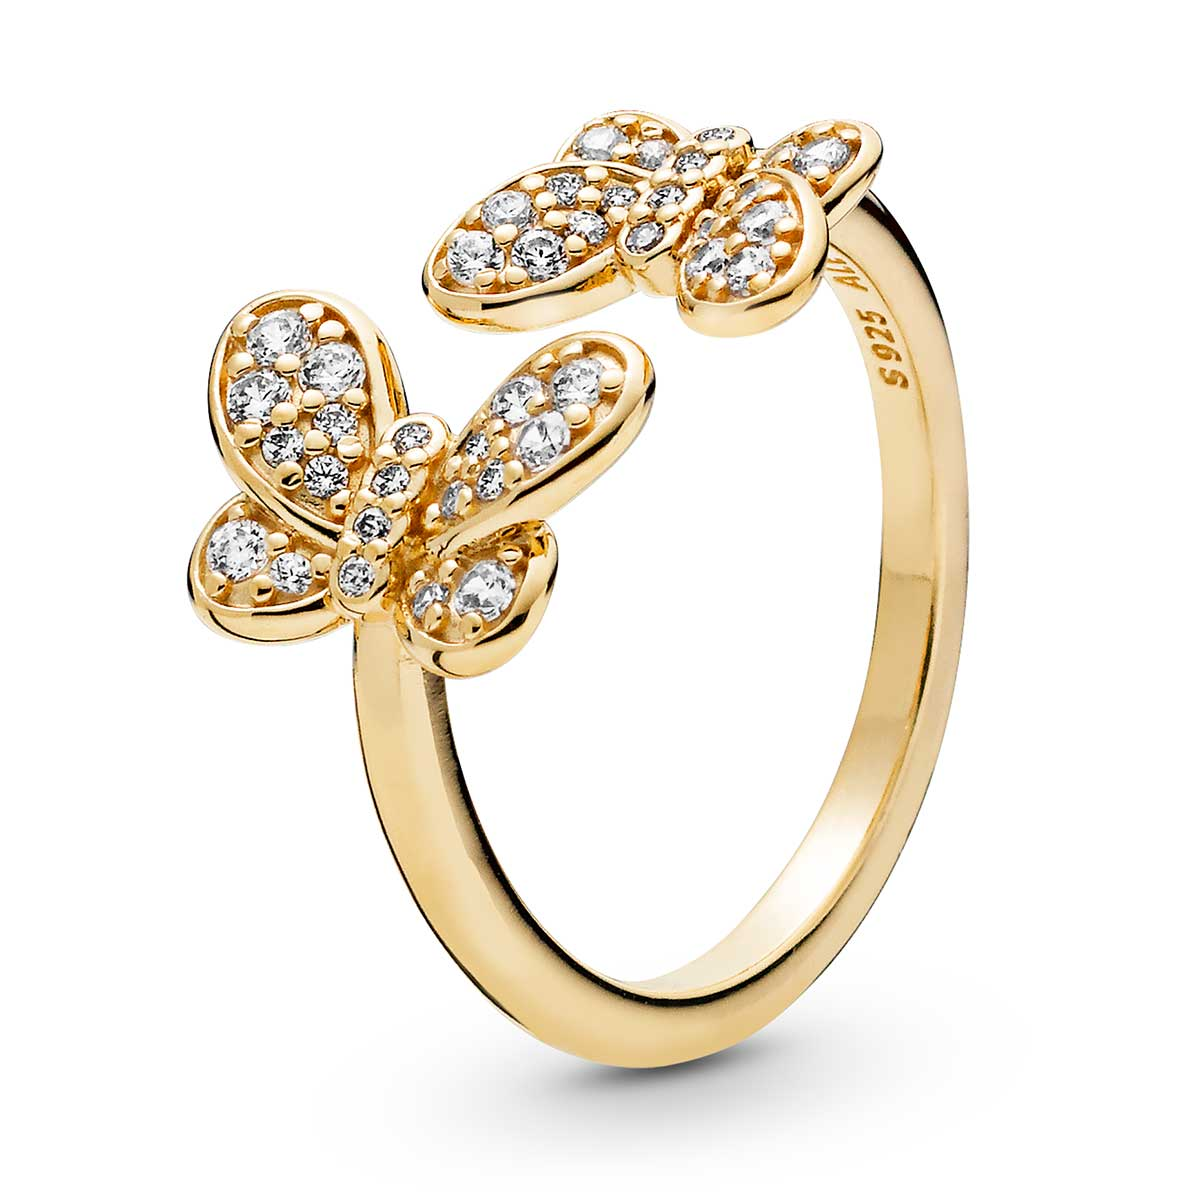 053b3c489 PANDORA Dazzling Butterflies Ring, Pandora Shine™ & Clear CZ: Precious  Accents, Ltd.